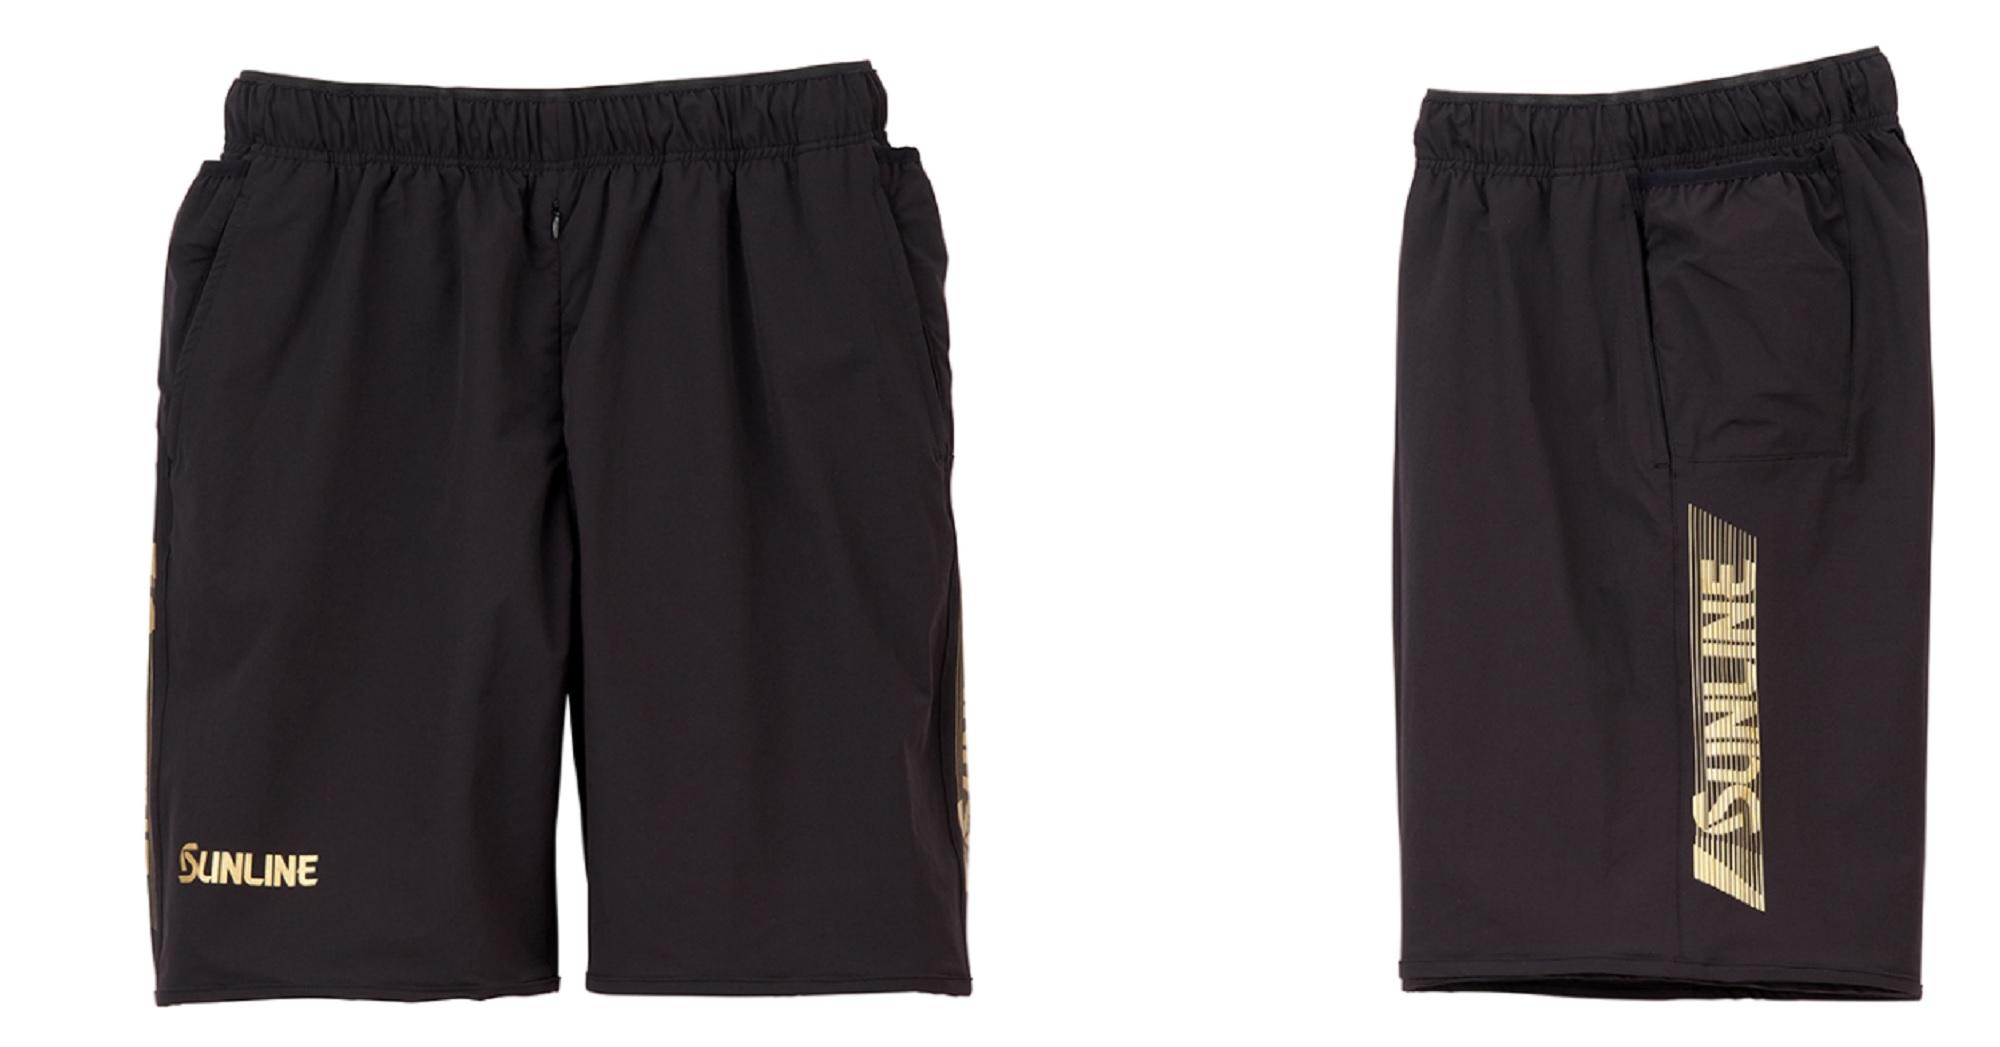 Sunline SUW-1214 Shorts Stretch Black Size L (2678)